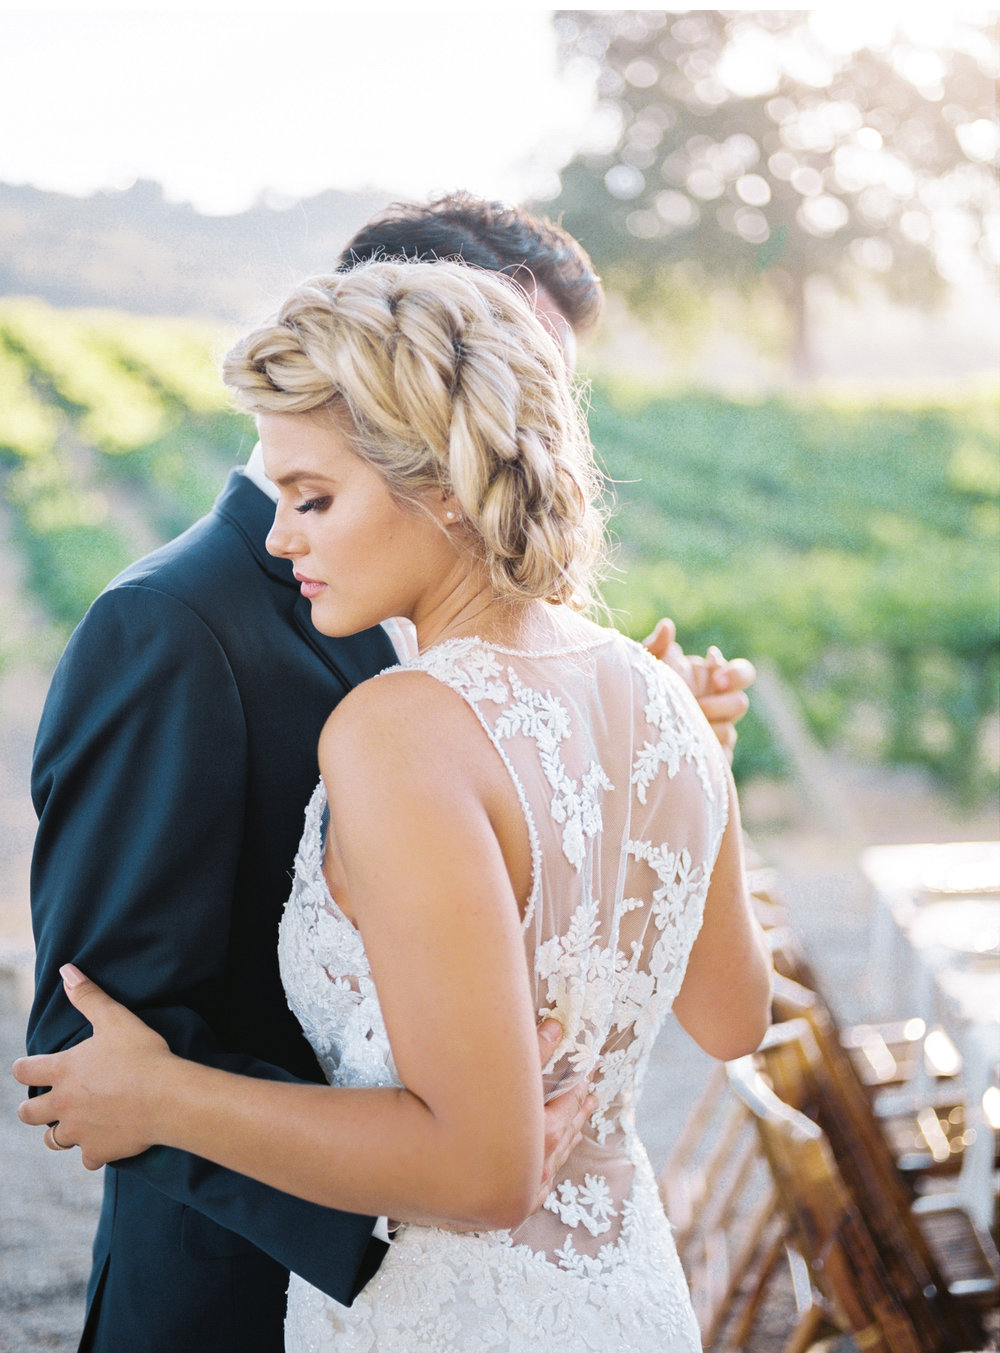 Malibu-Weddings-Natalie-Schutt-Photography_06.jpg